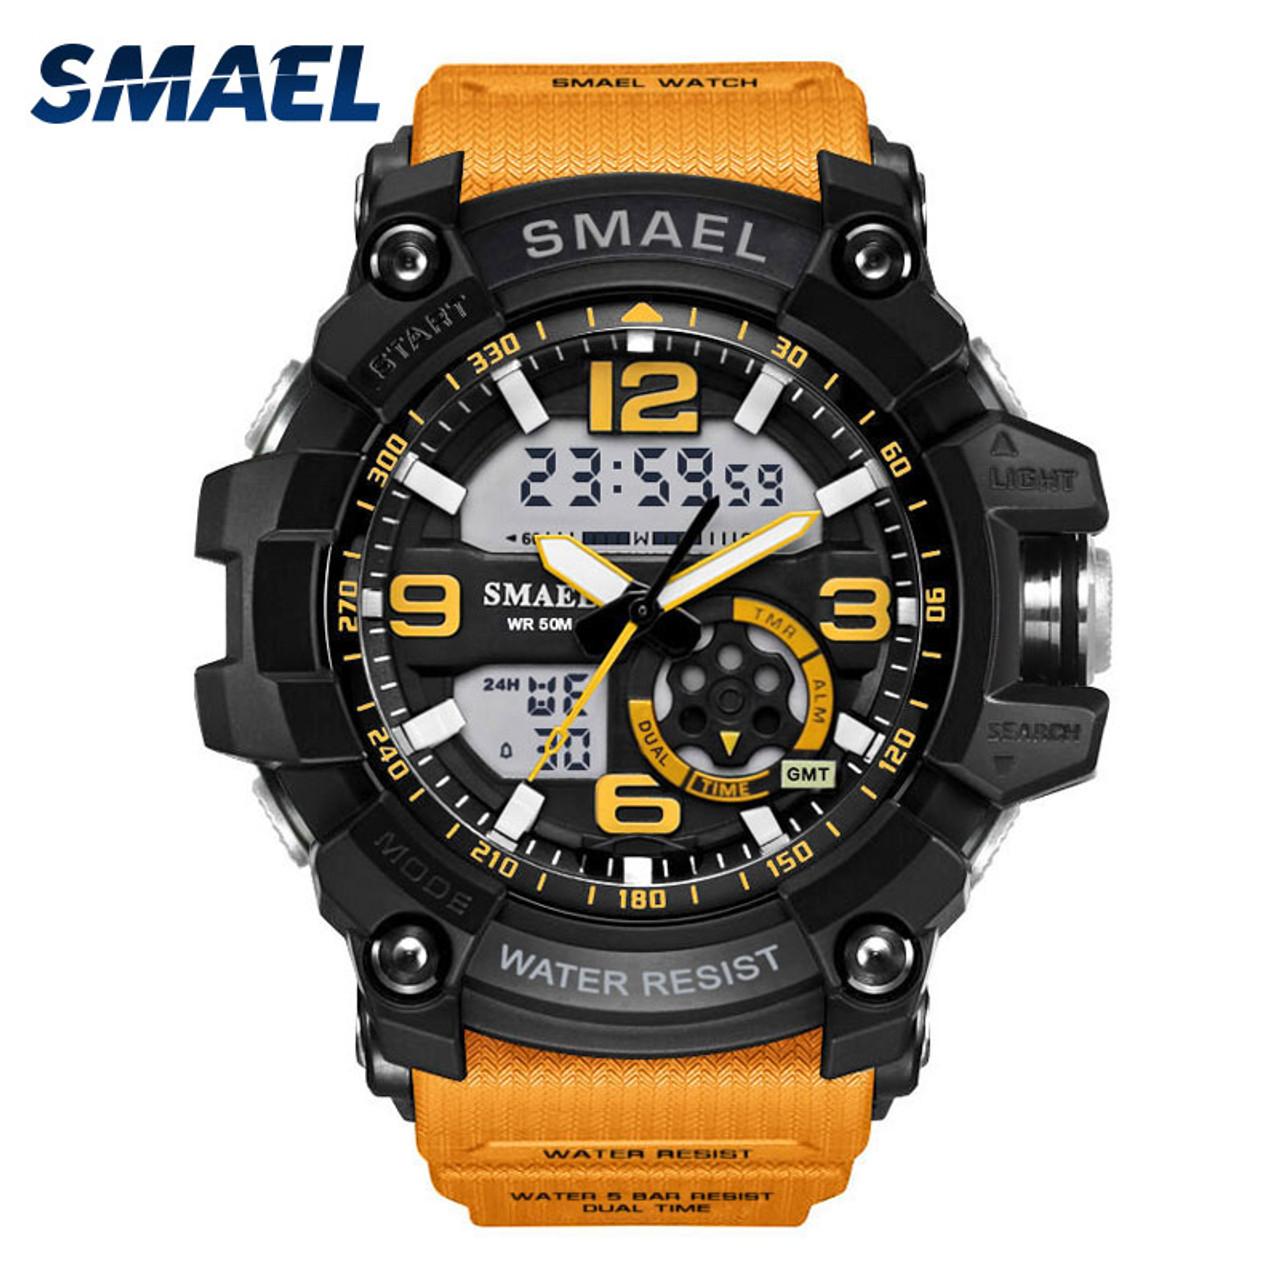 93883bd2 S Shock Military Watches Army Men's Wristwatch LED Quartz Watch Digtial  Dual Time Men Clock 1617 reloj hombre Sport Watch Army